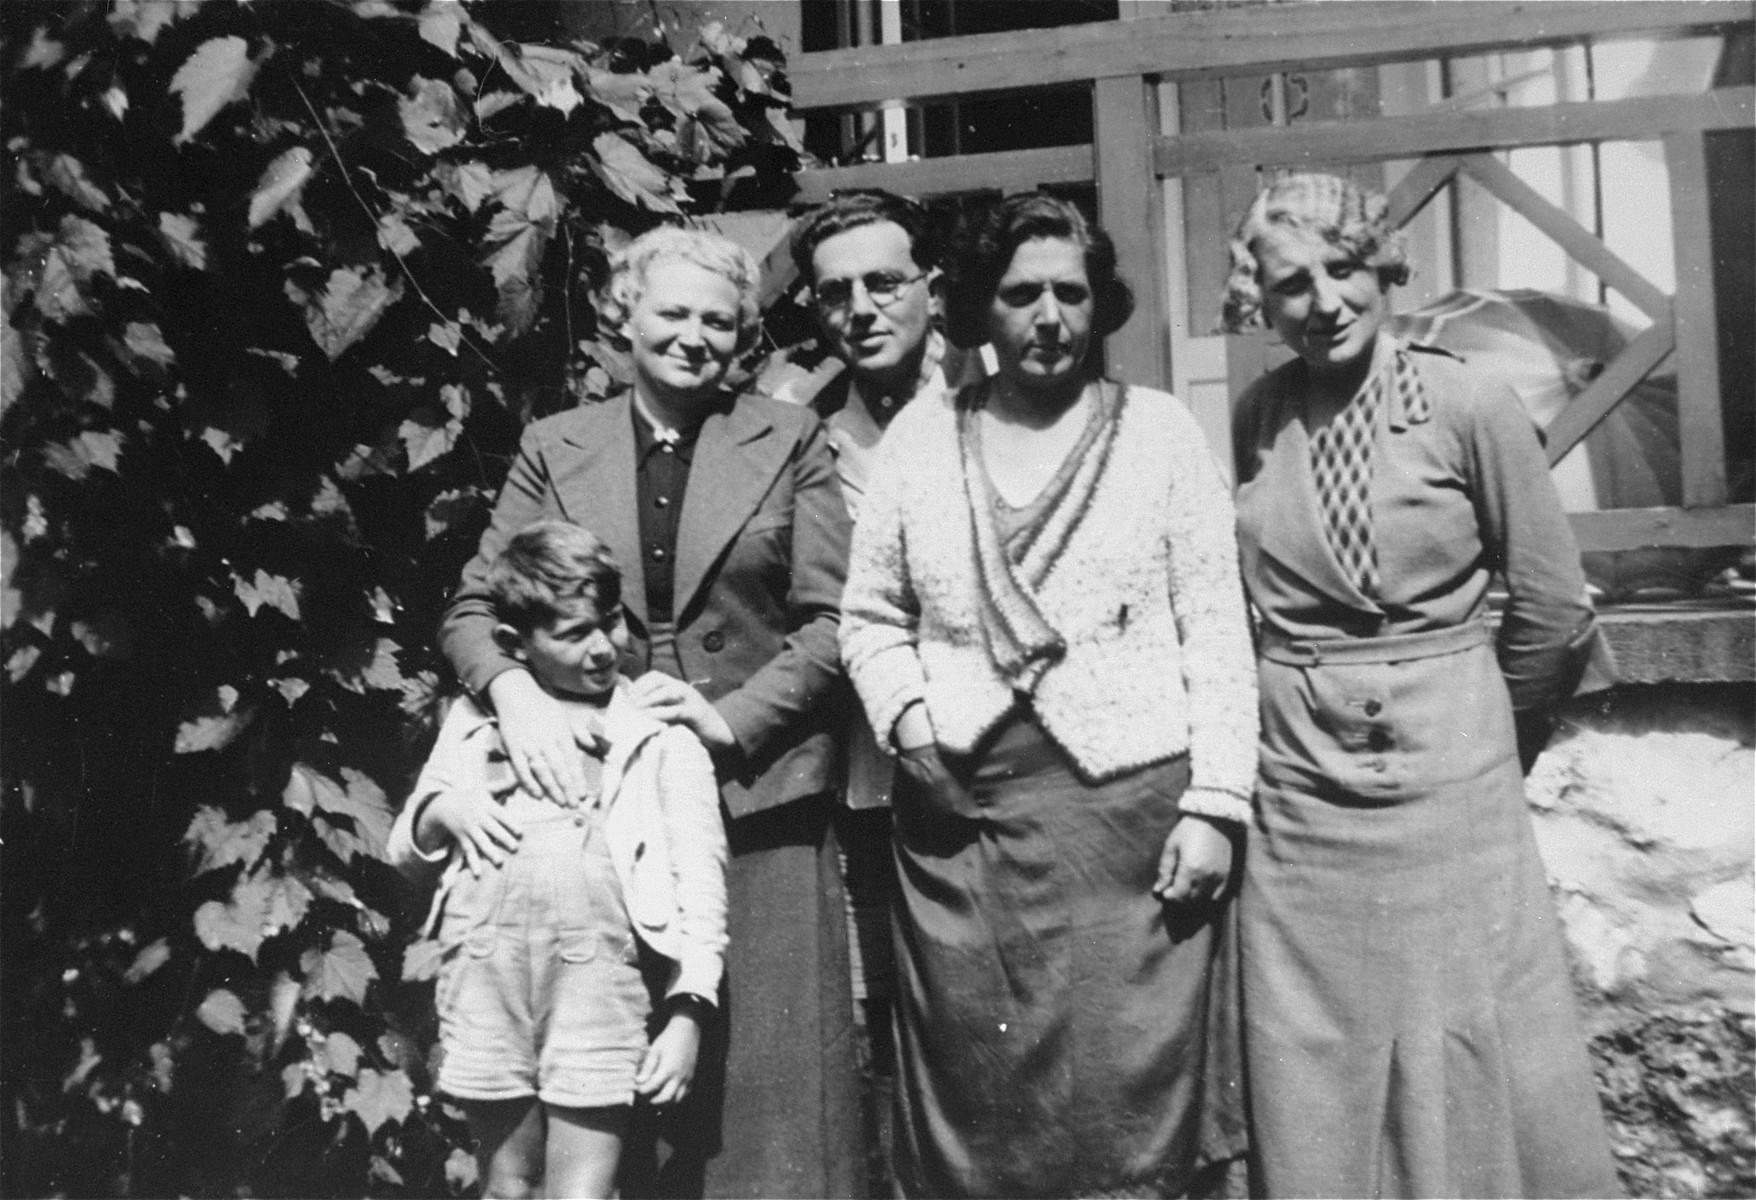 Members of the Goldstaub family in Groebing, Austria.